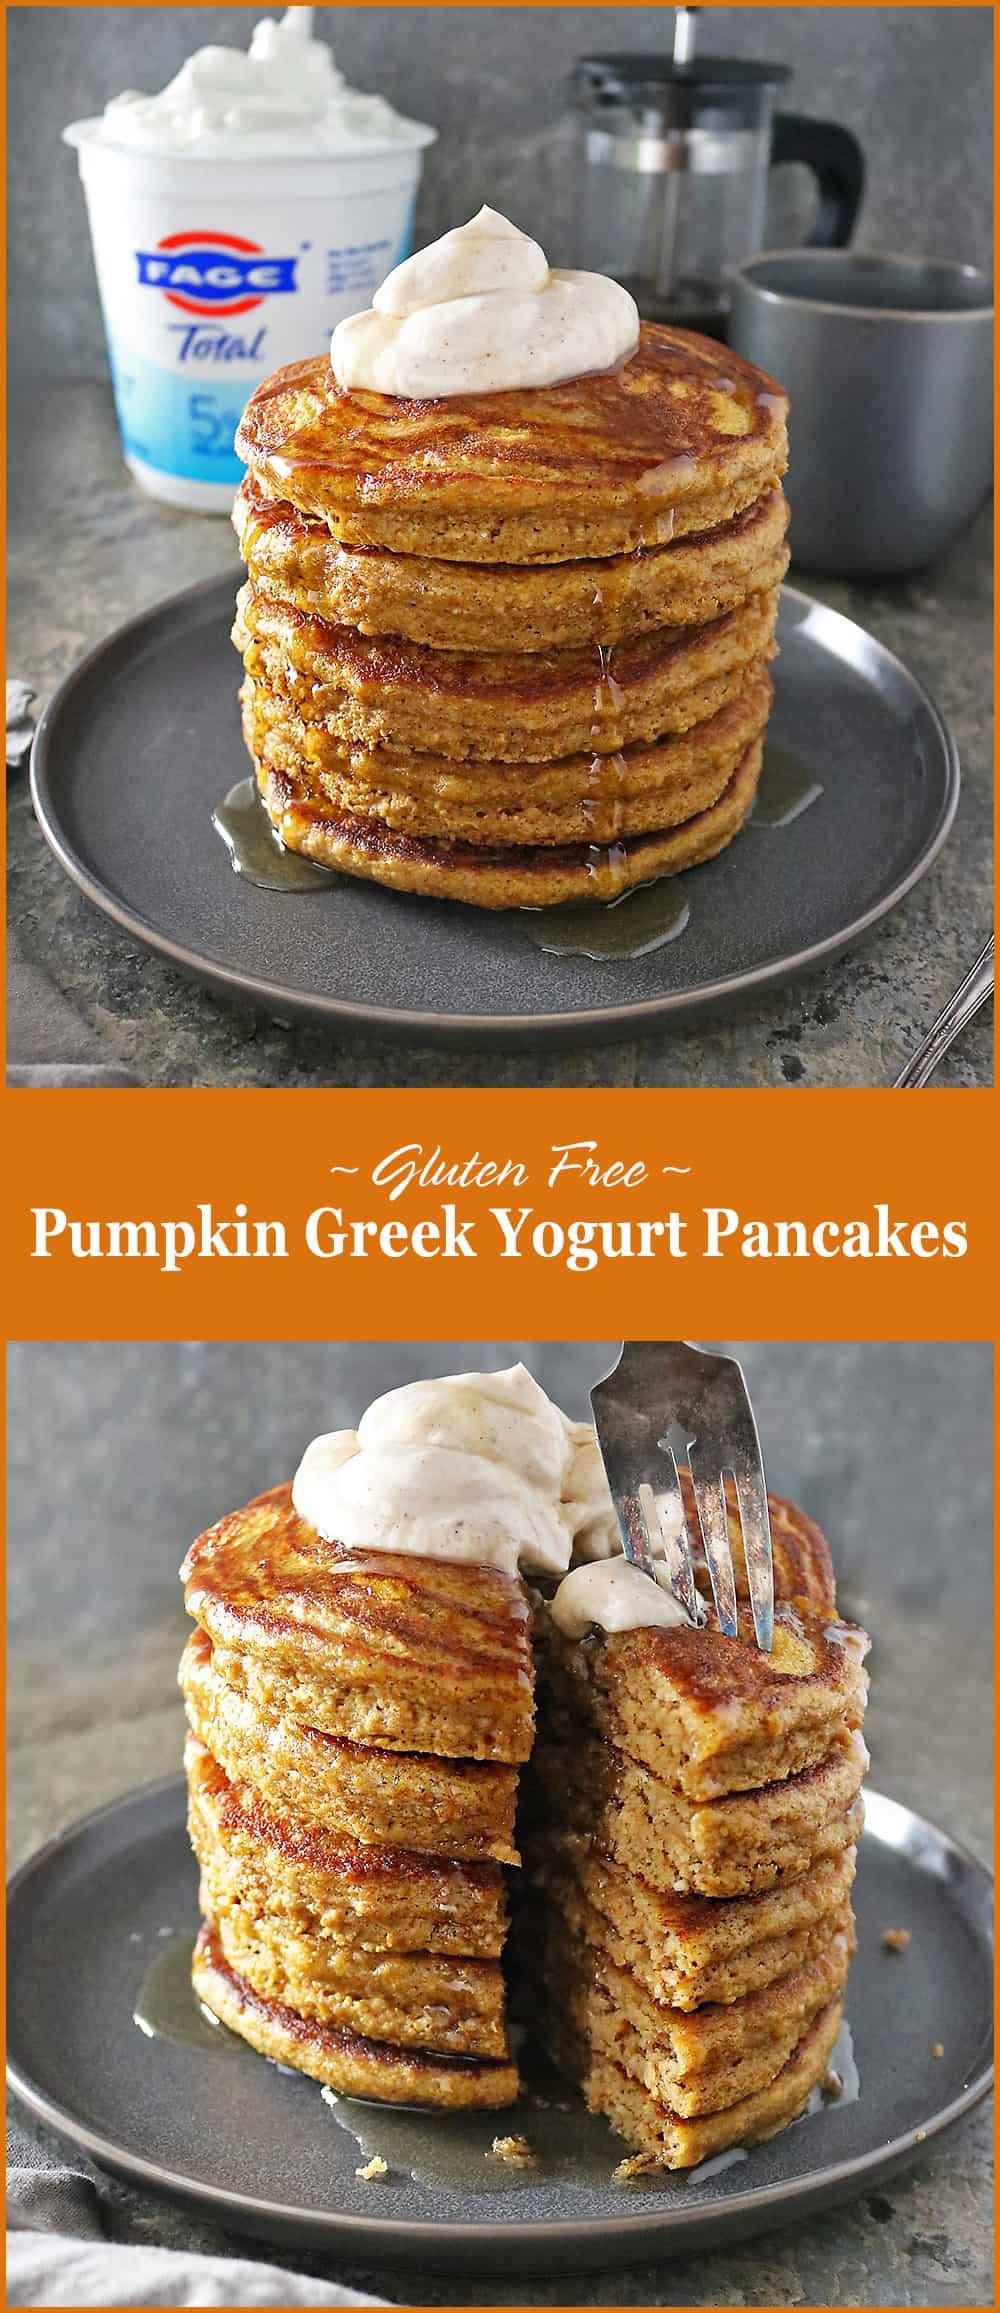 #ad Delicious Easy Gluten Free Pumpkin Greek Yogurt Pancakes Stack @fage @foodietribe #foodietribe